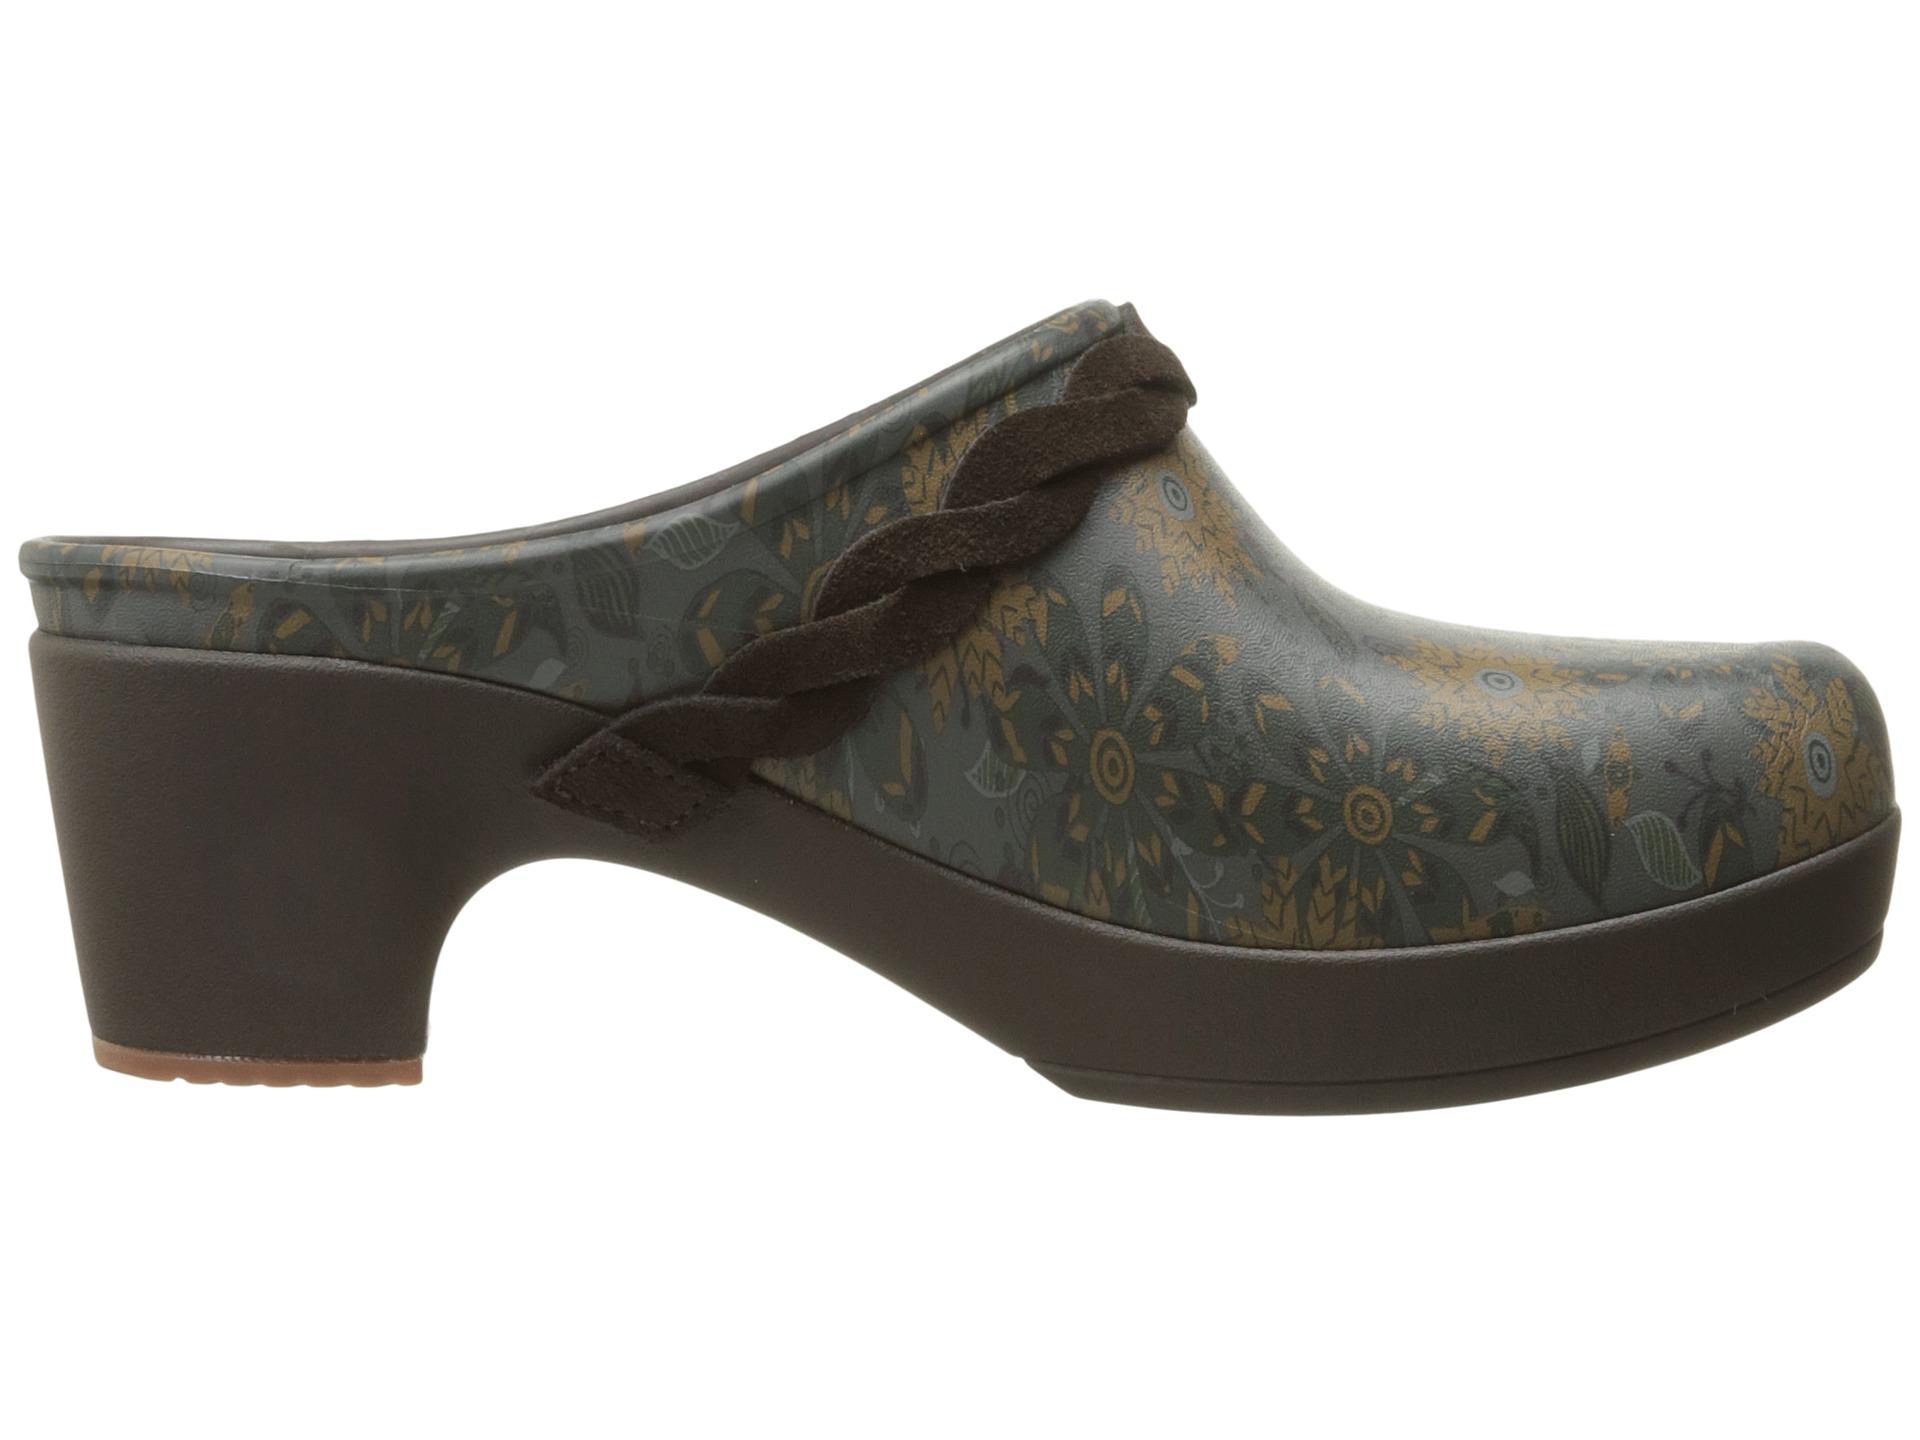 Clog Shoes For Men Images